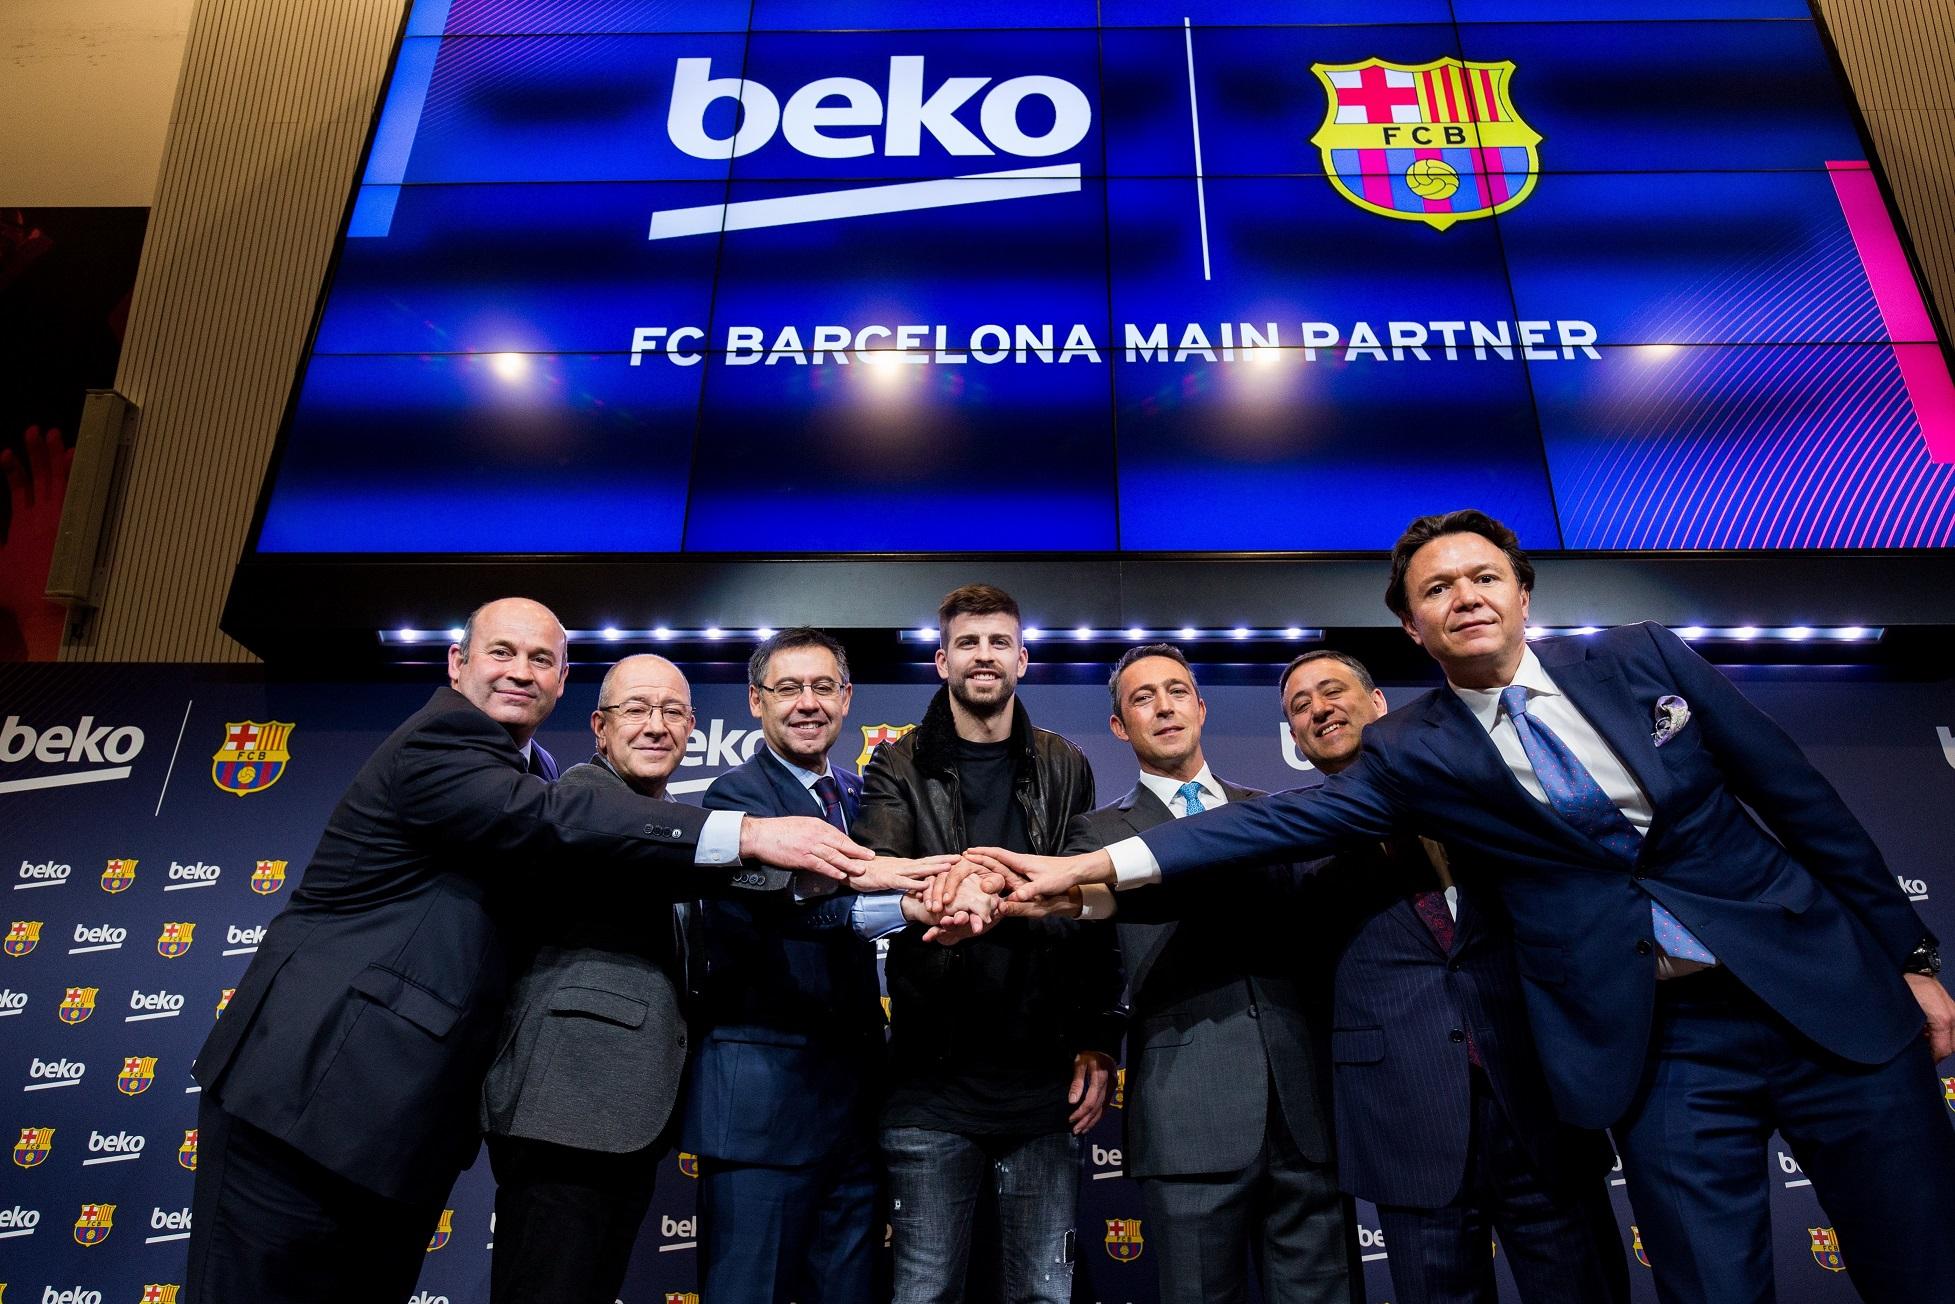 Beko FC Barcelona'nın Global Ana Sponsoru Oldu